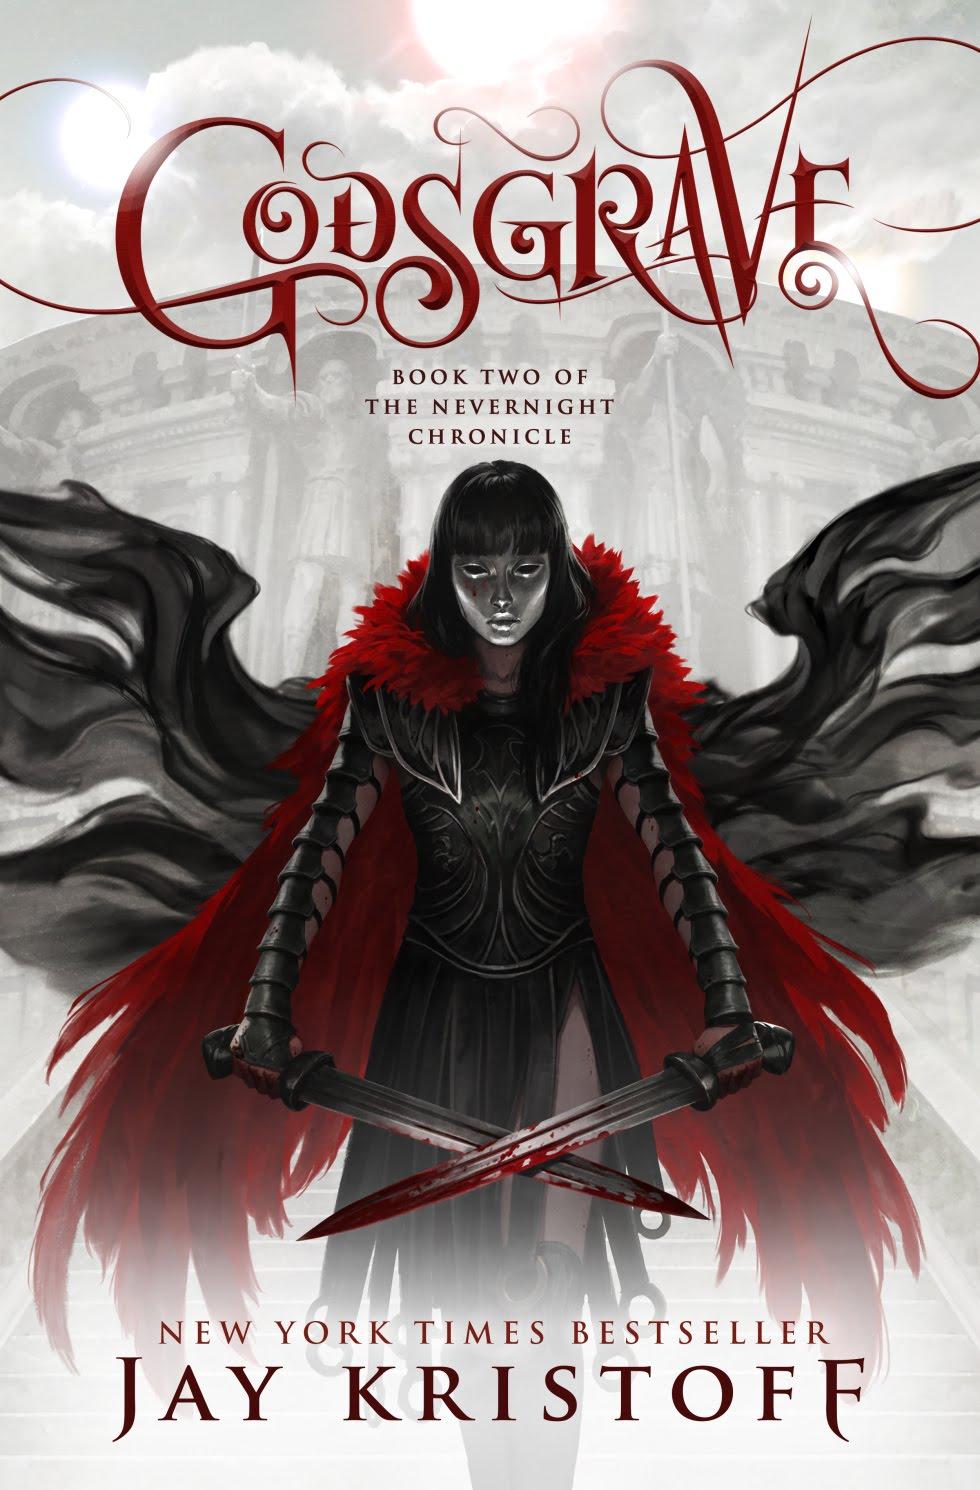 Godsgrave-Cover.jpg